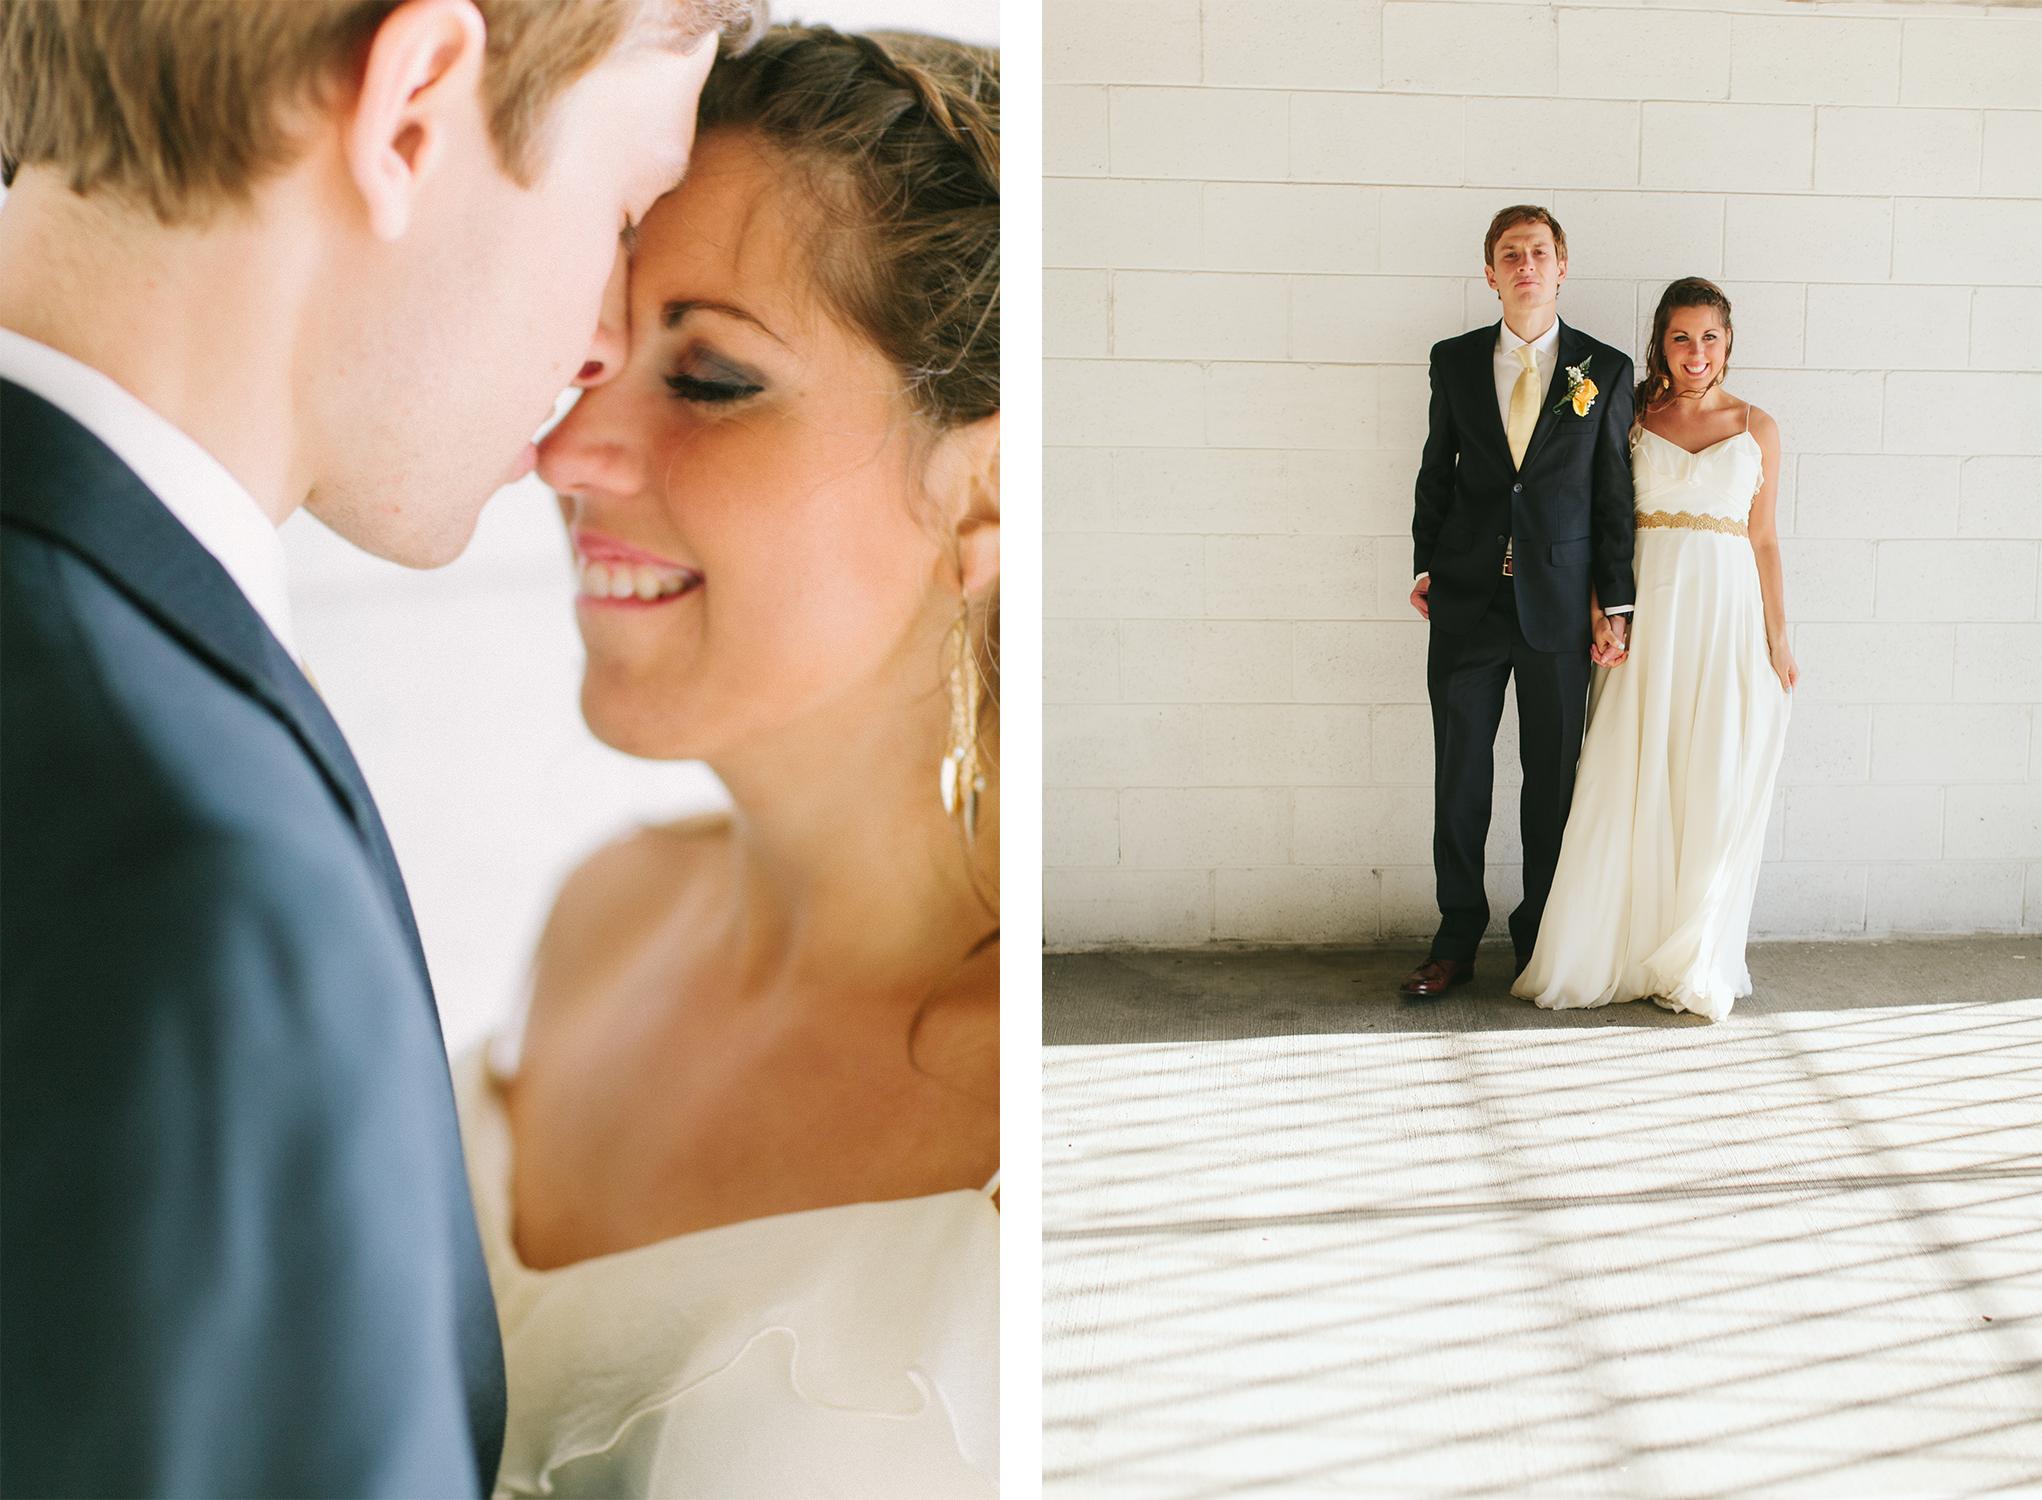 Atlanta-Wedding-Photographer-Kathryn-McCrary-Photography-Collage-6.jpg